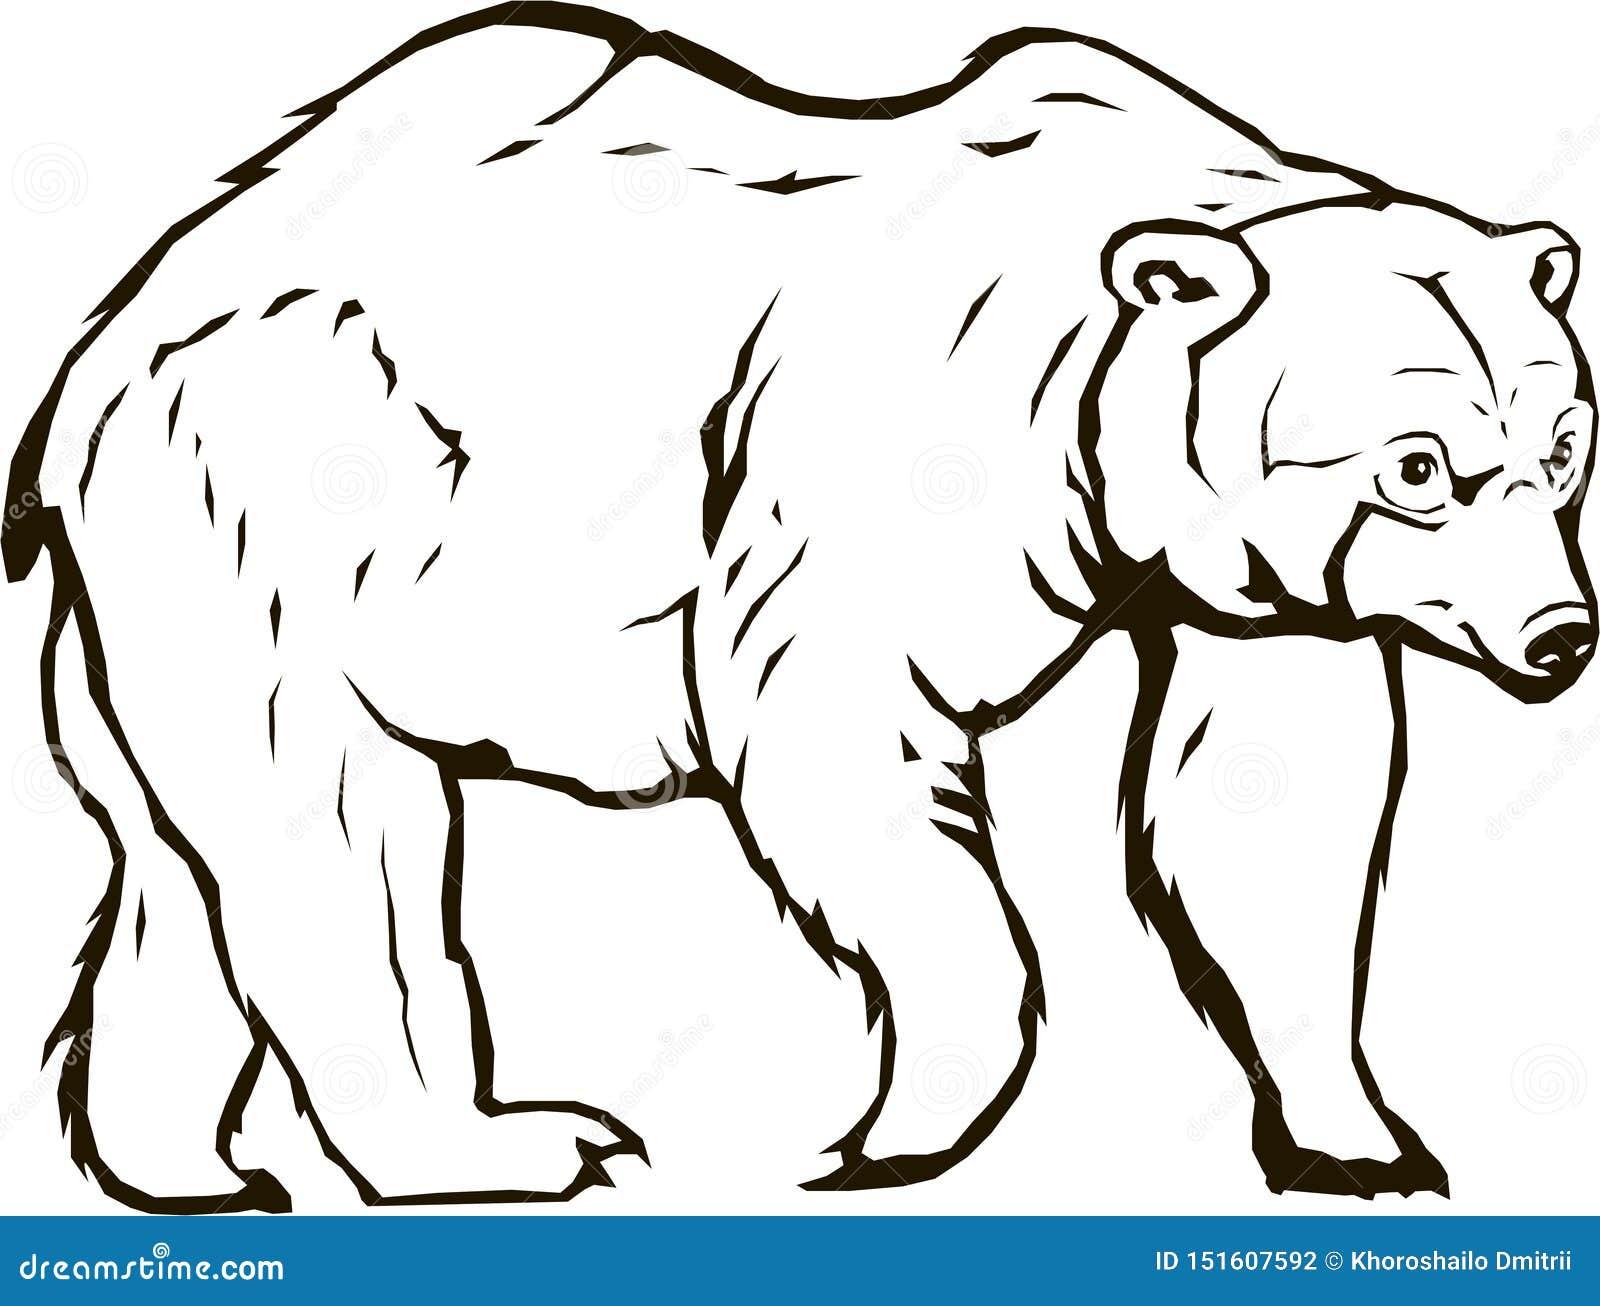 Bear vector blackbear